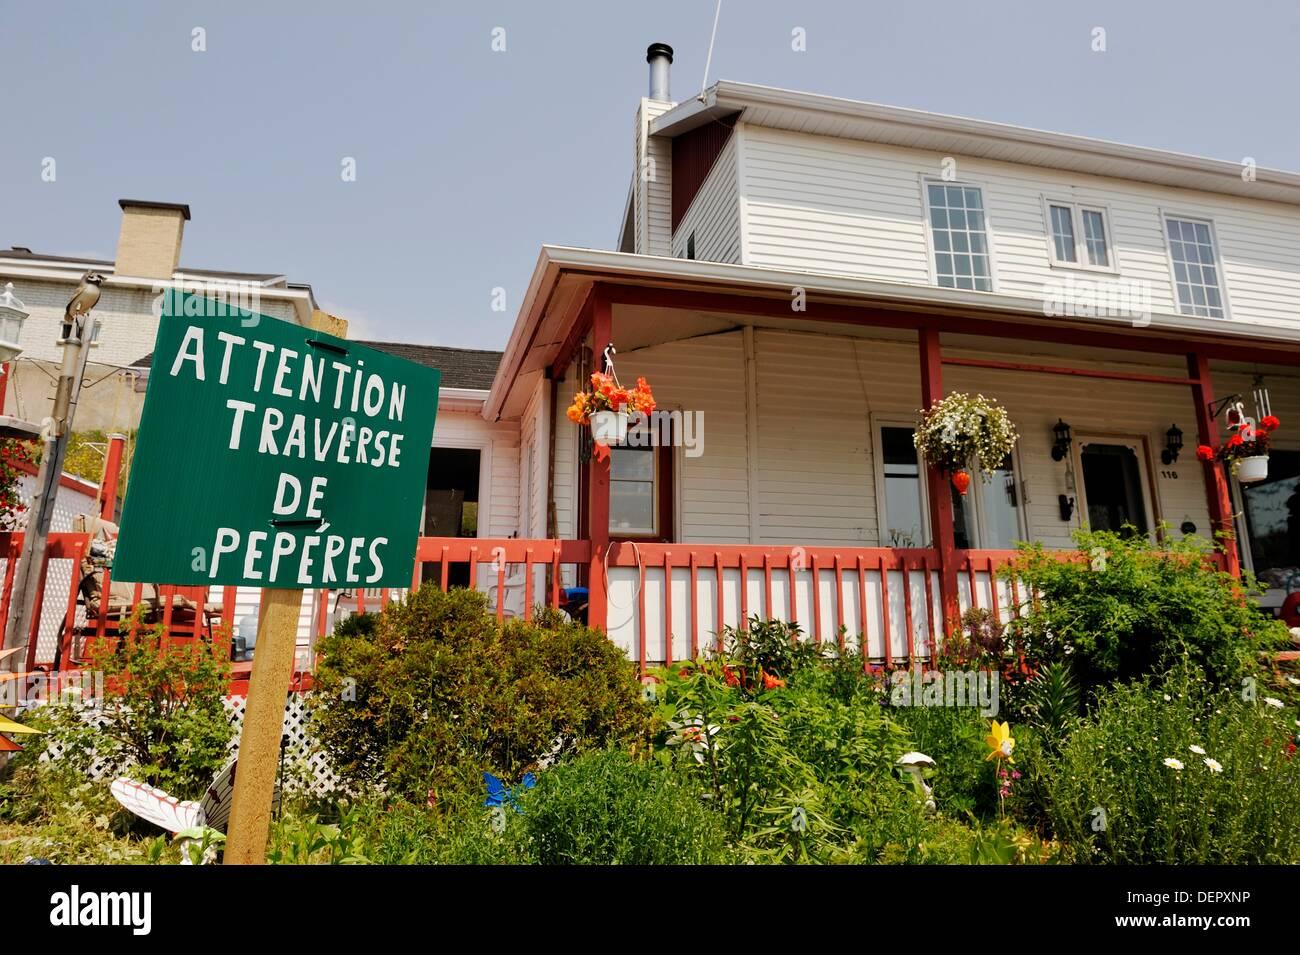 Humorístico Cote-Nord signpost, Tadoussac, Región, Provincia de Quebec, Canadá, América del Norte Imagen De Stock